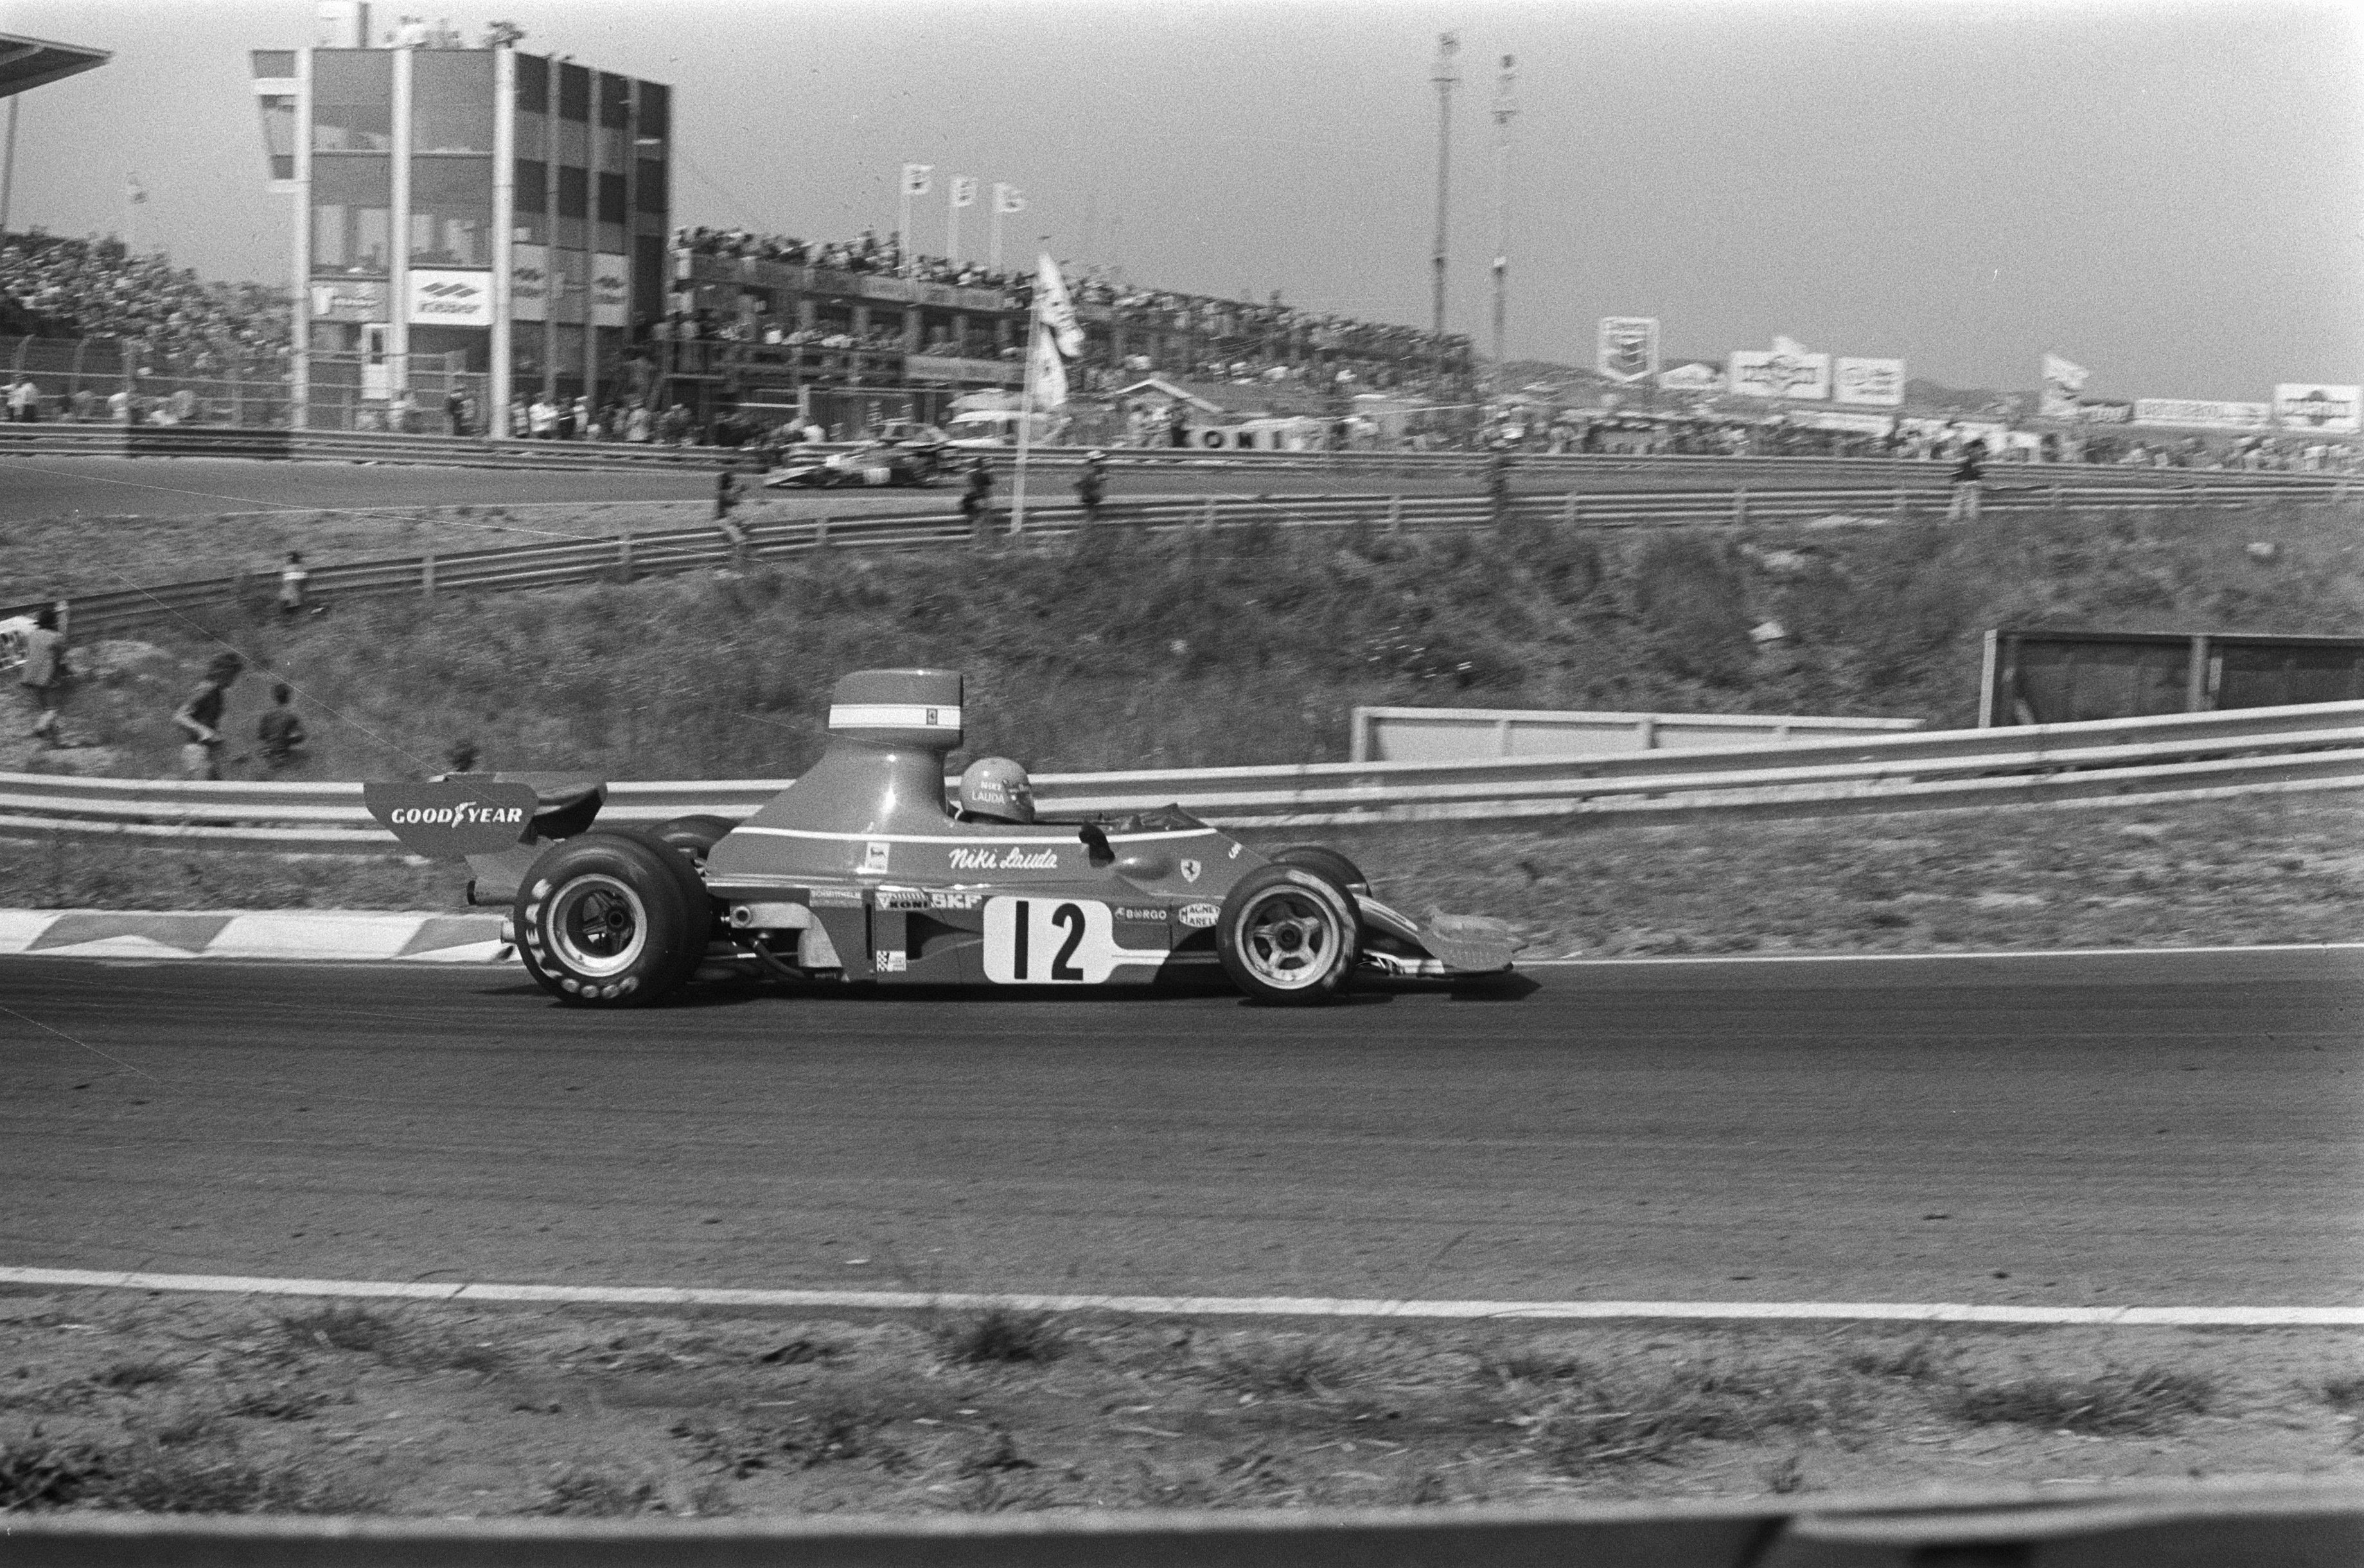 Lauda_at_1974_Dutch_Grand_Prix_(3).jpg